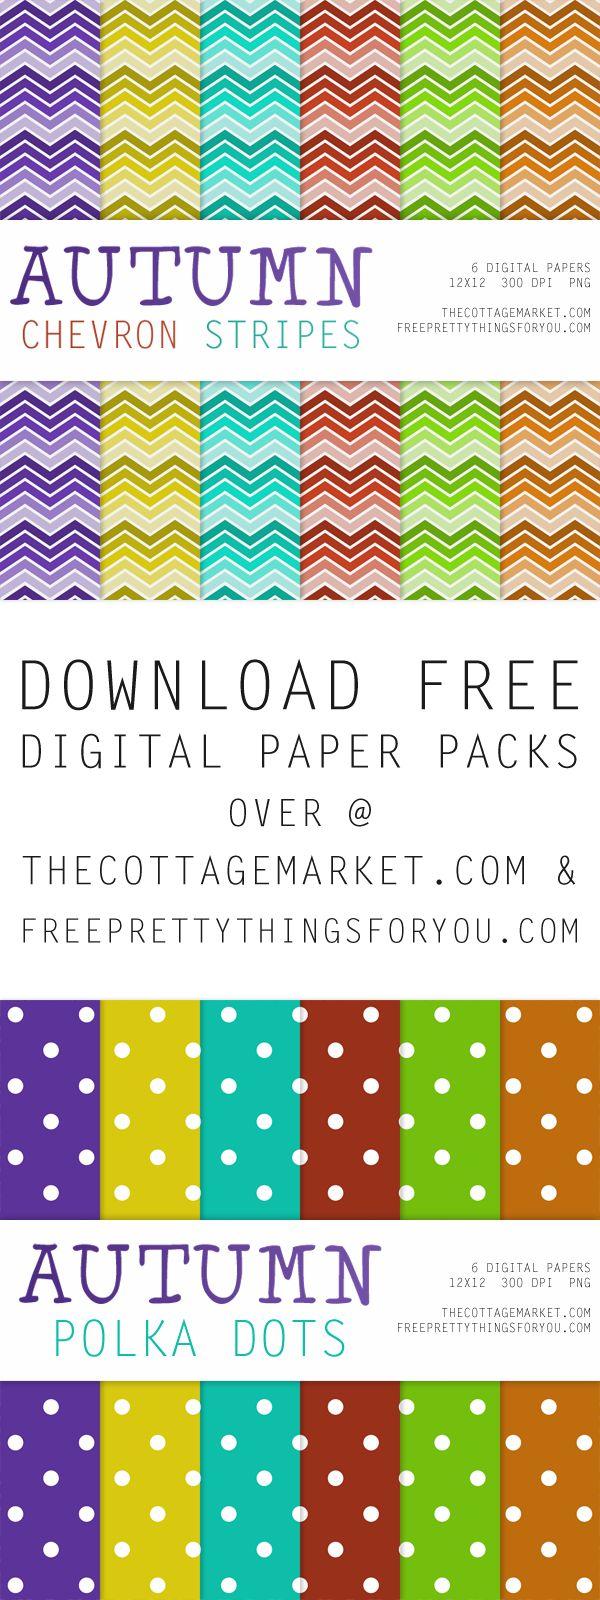 Scrapbook paper designs download - Free Autumn Digital Scrapbooking Paper Packs Part 1 The Cottage Market Fallpaperpack